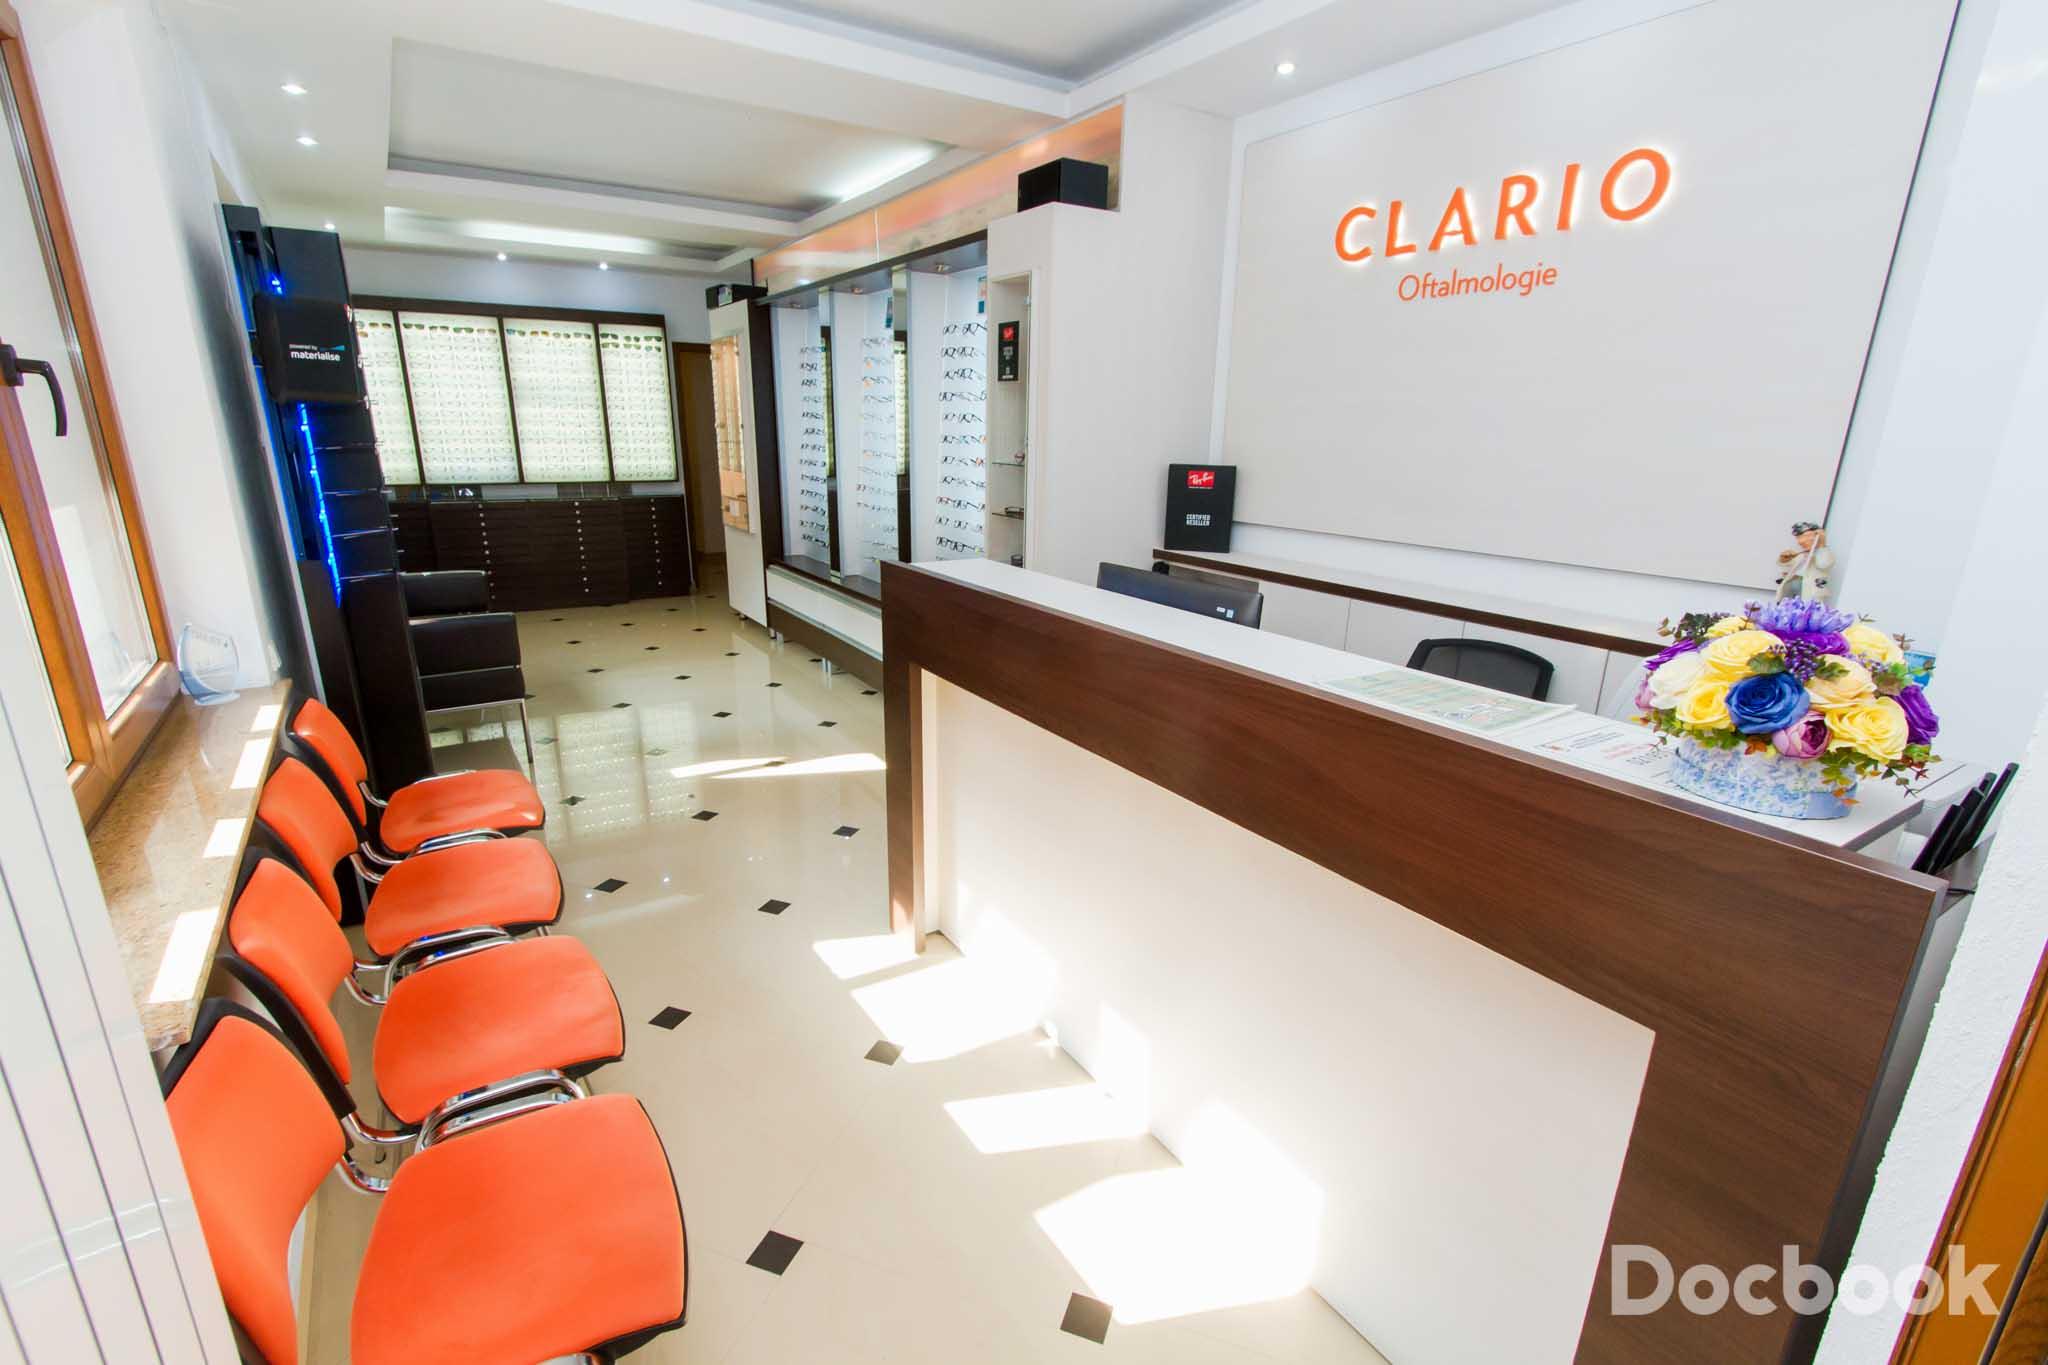 Clinica Clario Oftaclinic